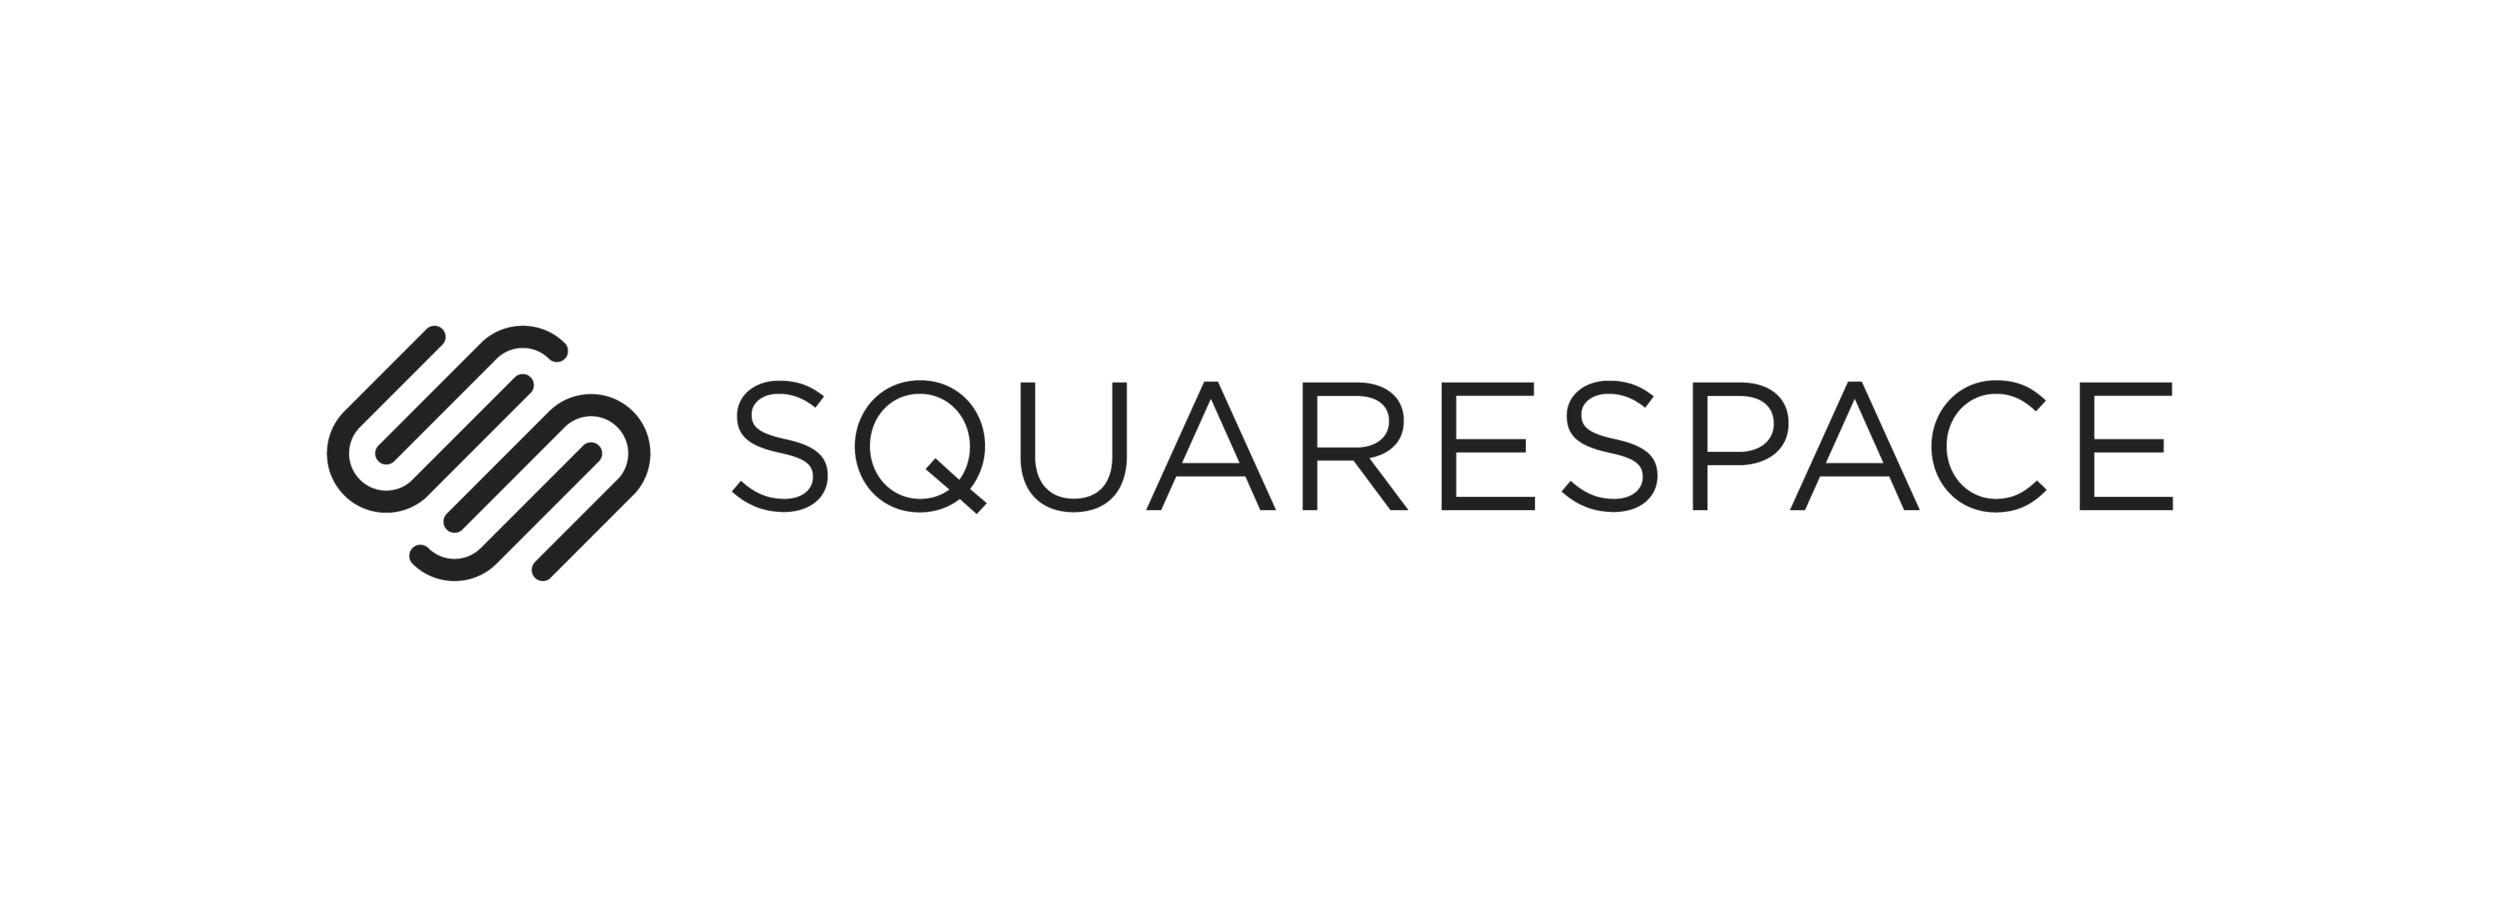 squarespace-logo-horizontal-black.png